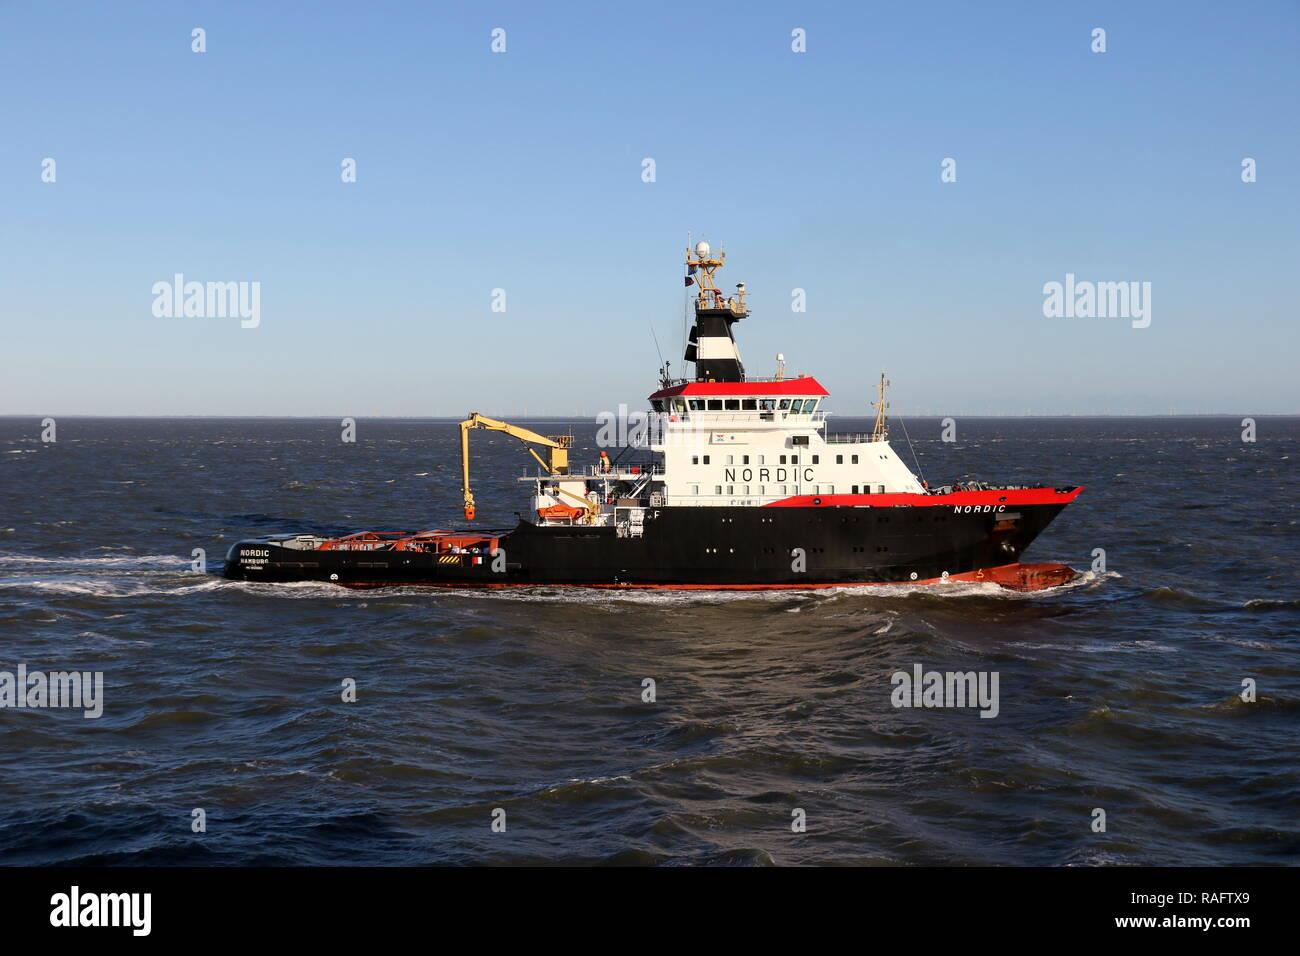 Emergency Tow Vessel Stock Photos & Emergency Tow Vessel